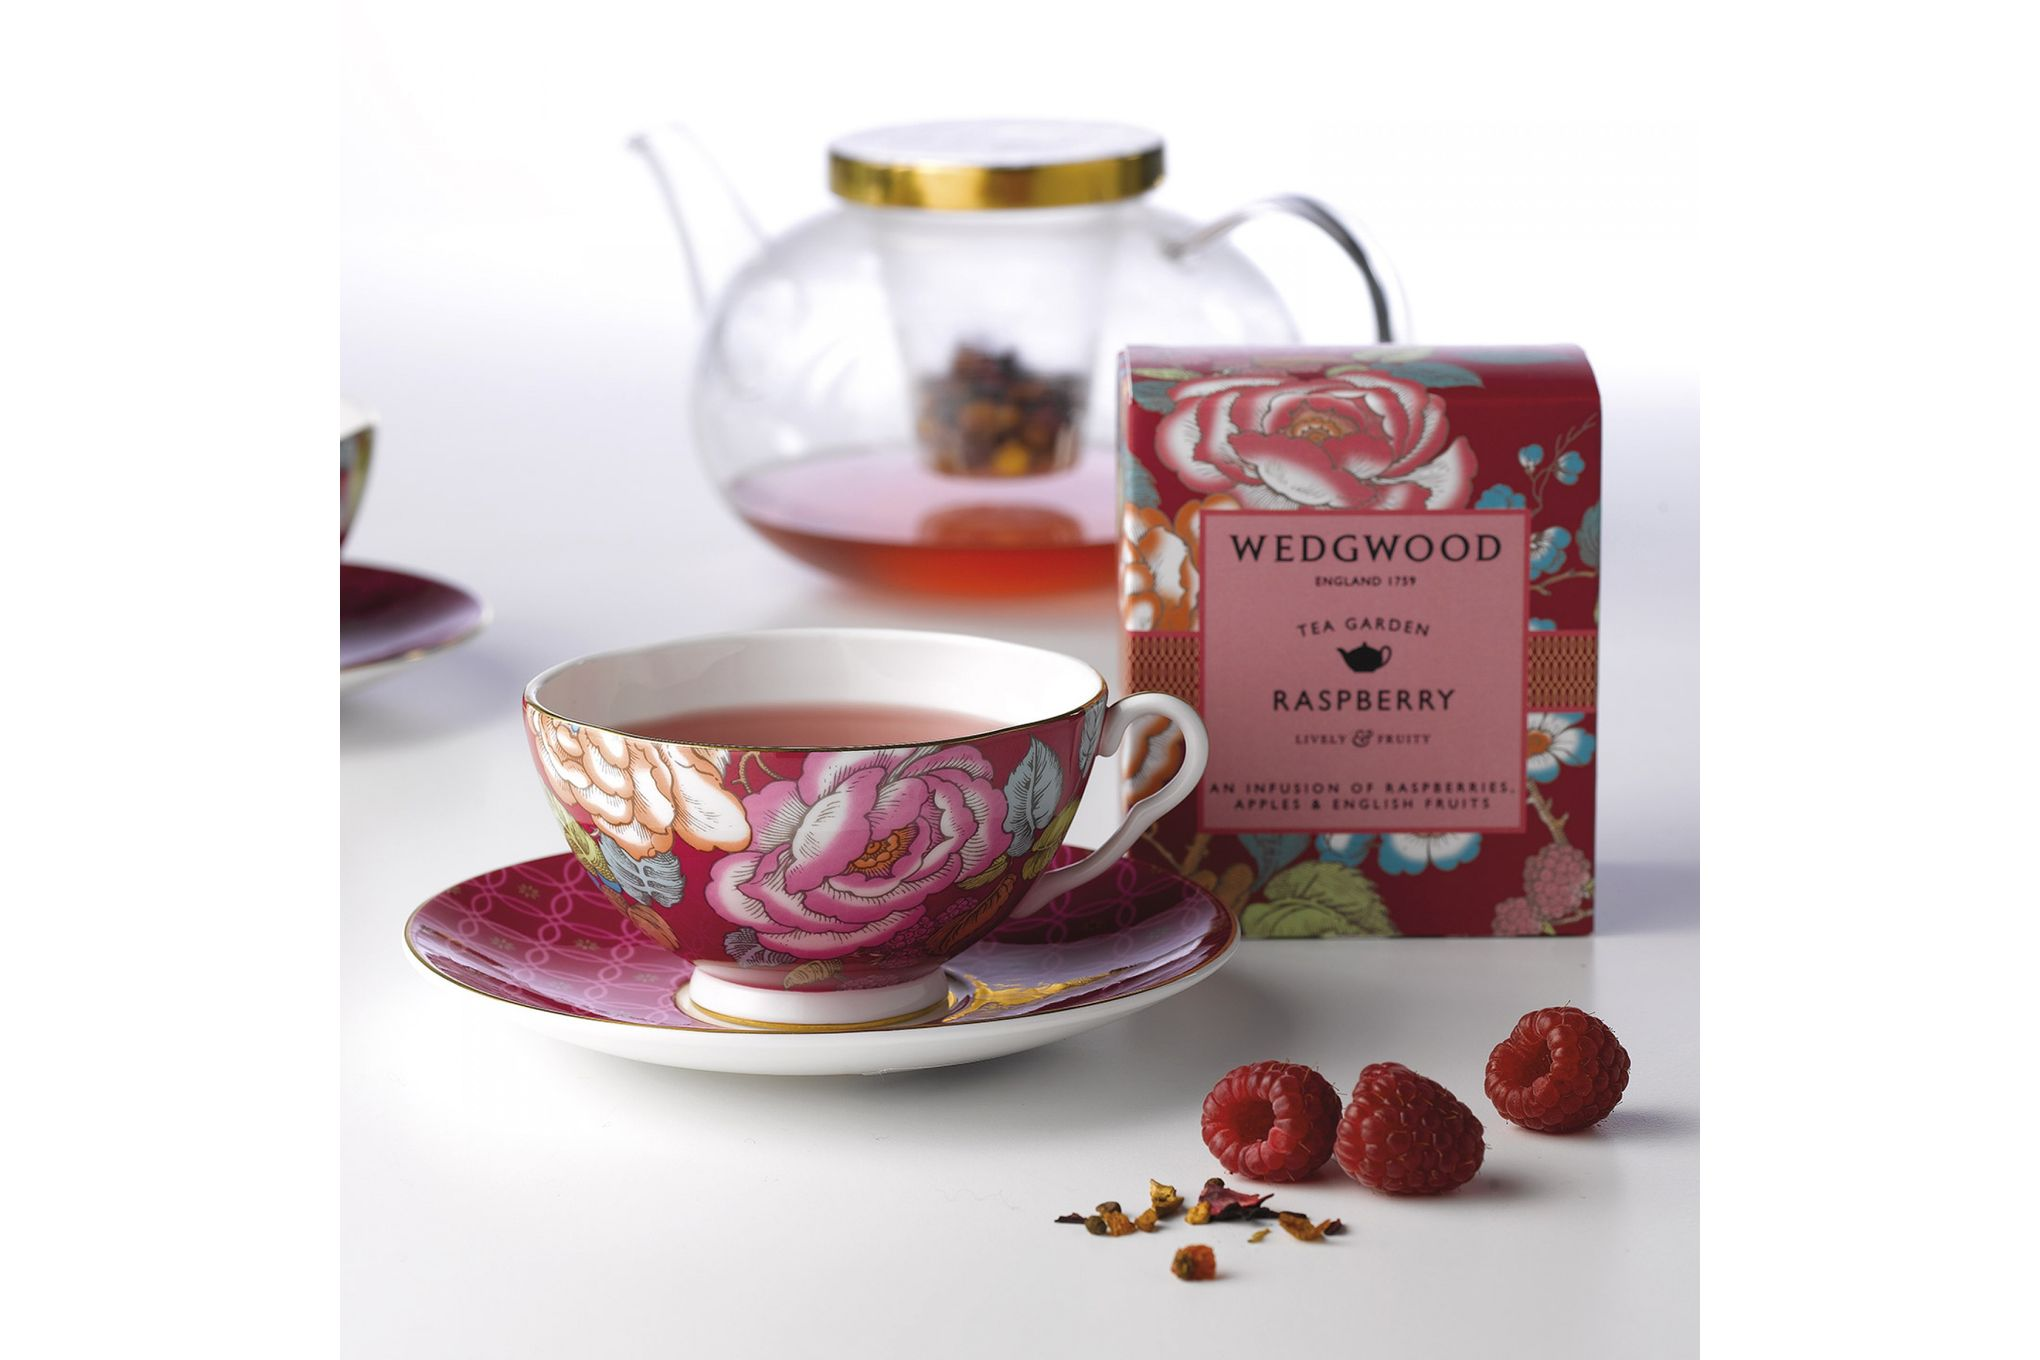 Wedgwood Tea Garden 3 Piece Set Plate 21cm, Teacup & Saucer Raspberry thumb 2